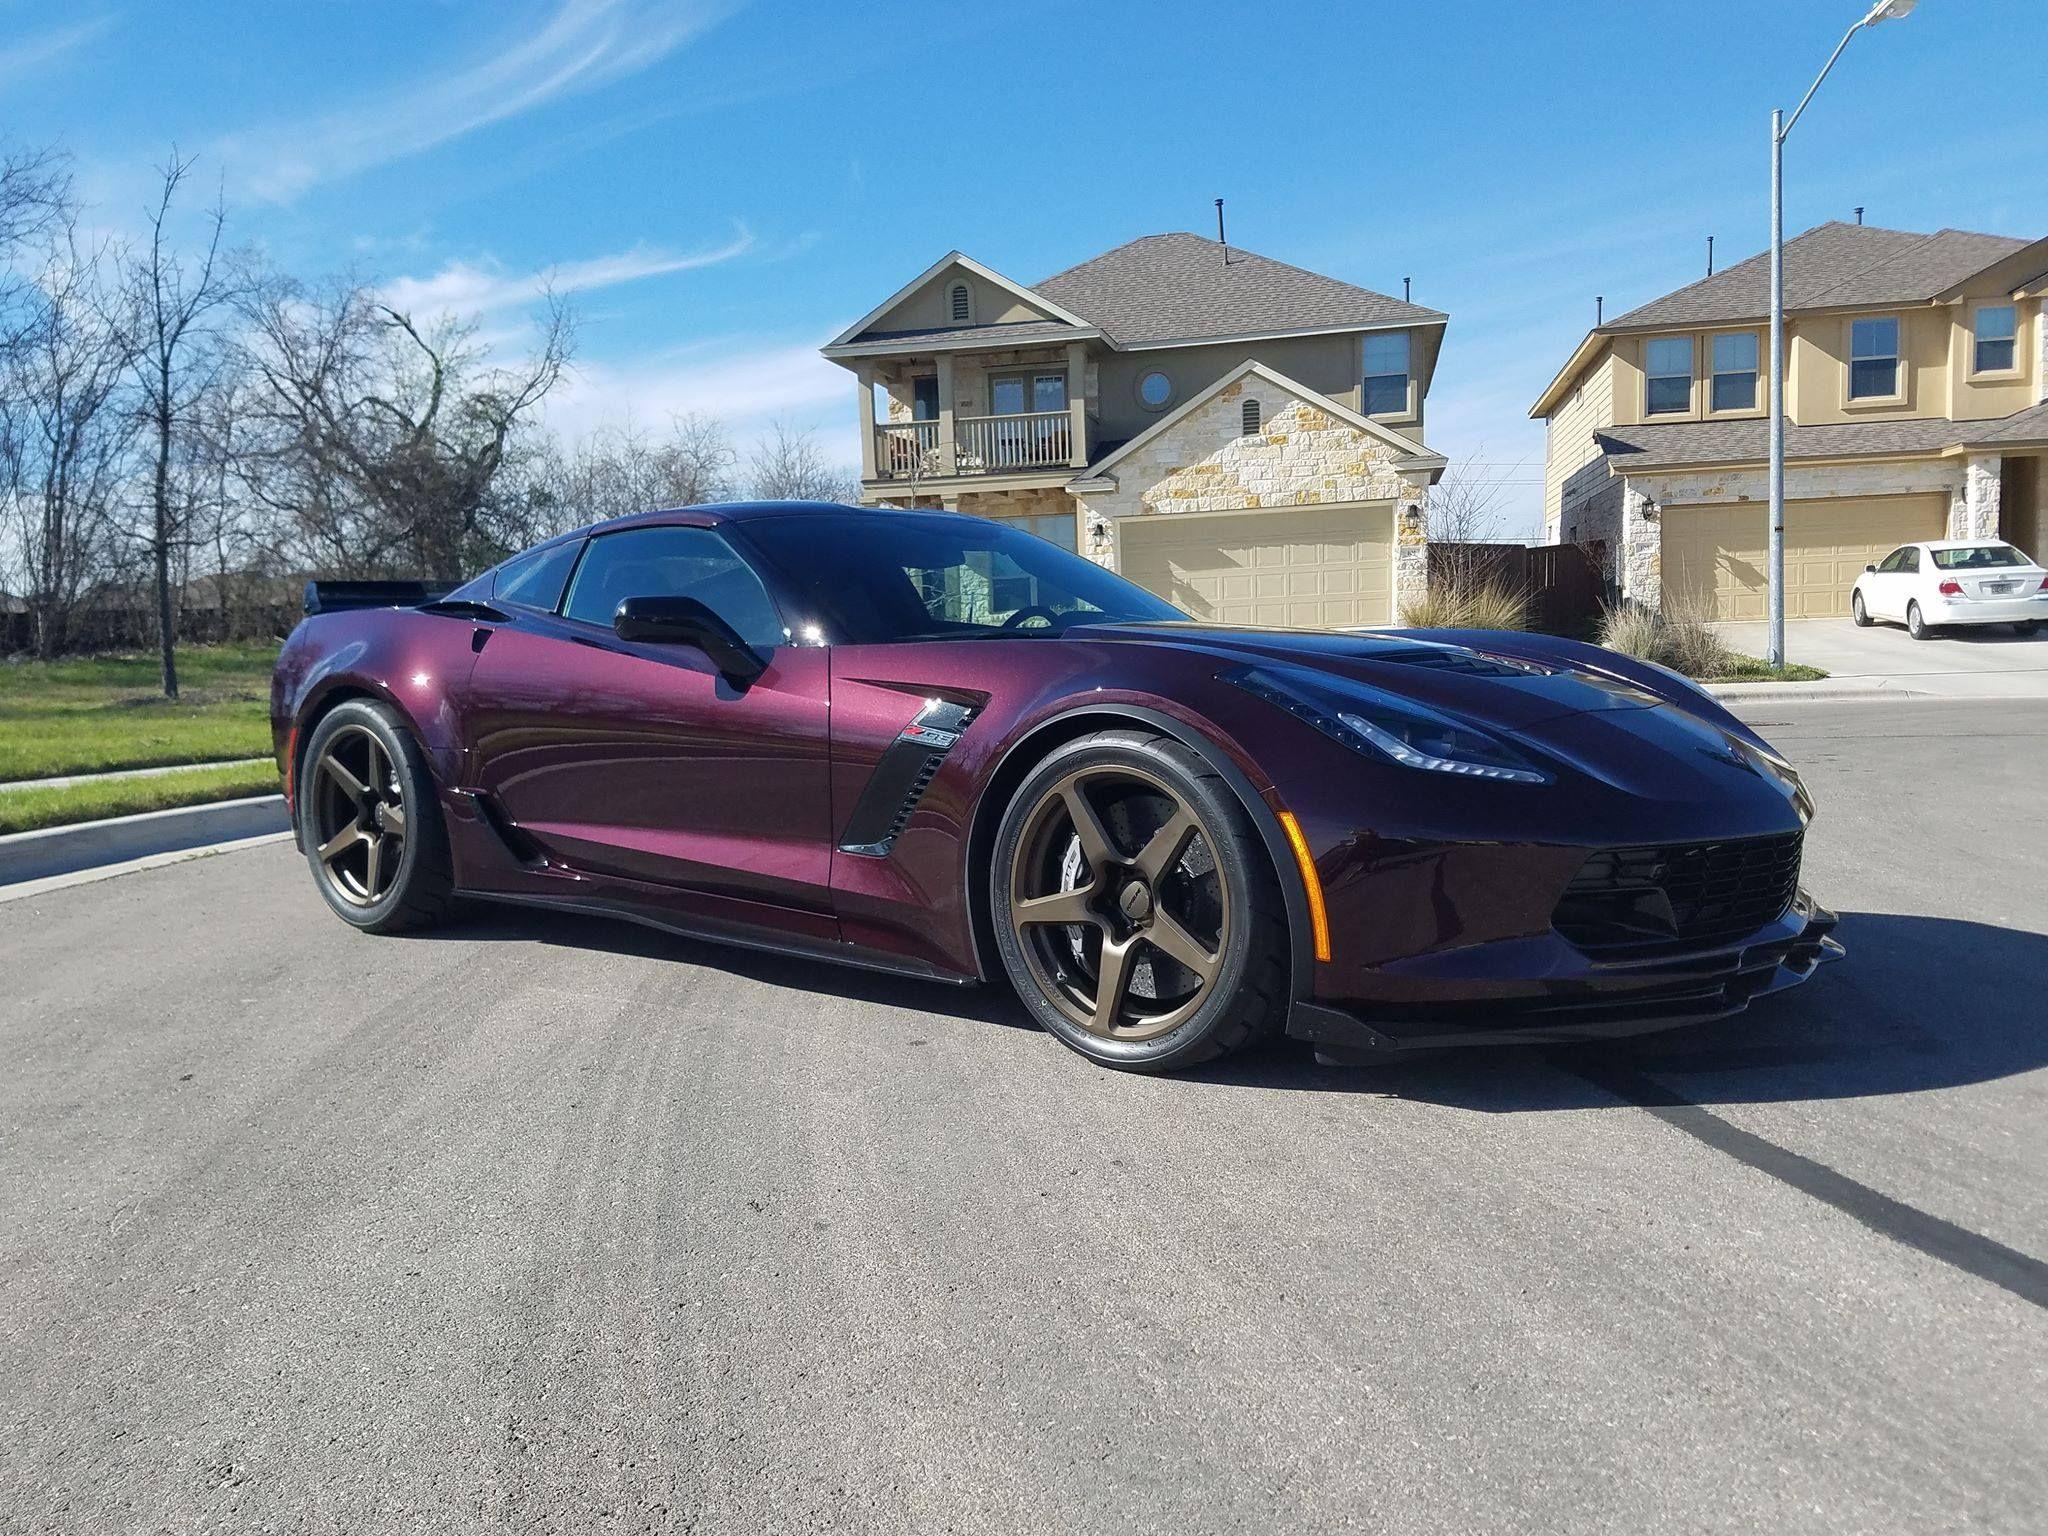 Chris neal s latest toy is this black rose c7 corvette z06 z07